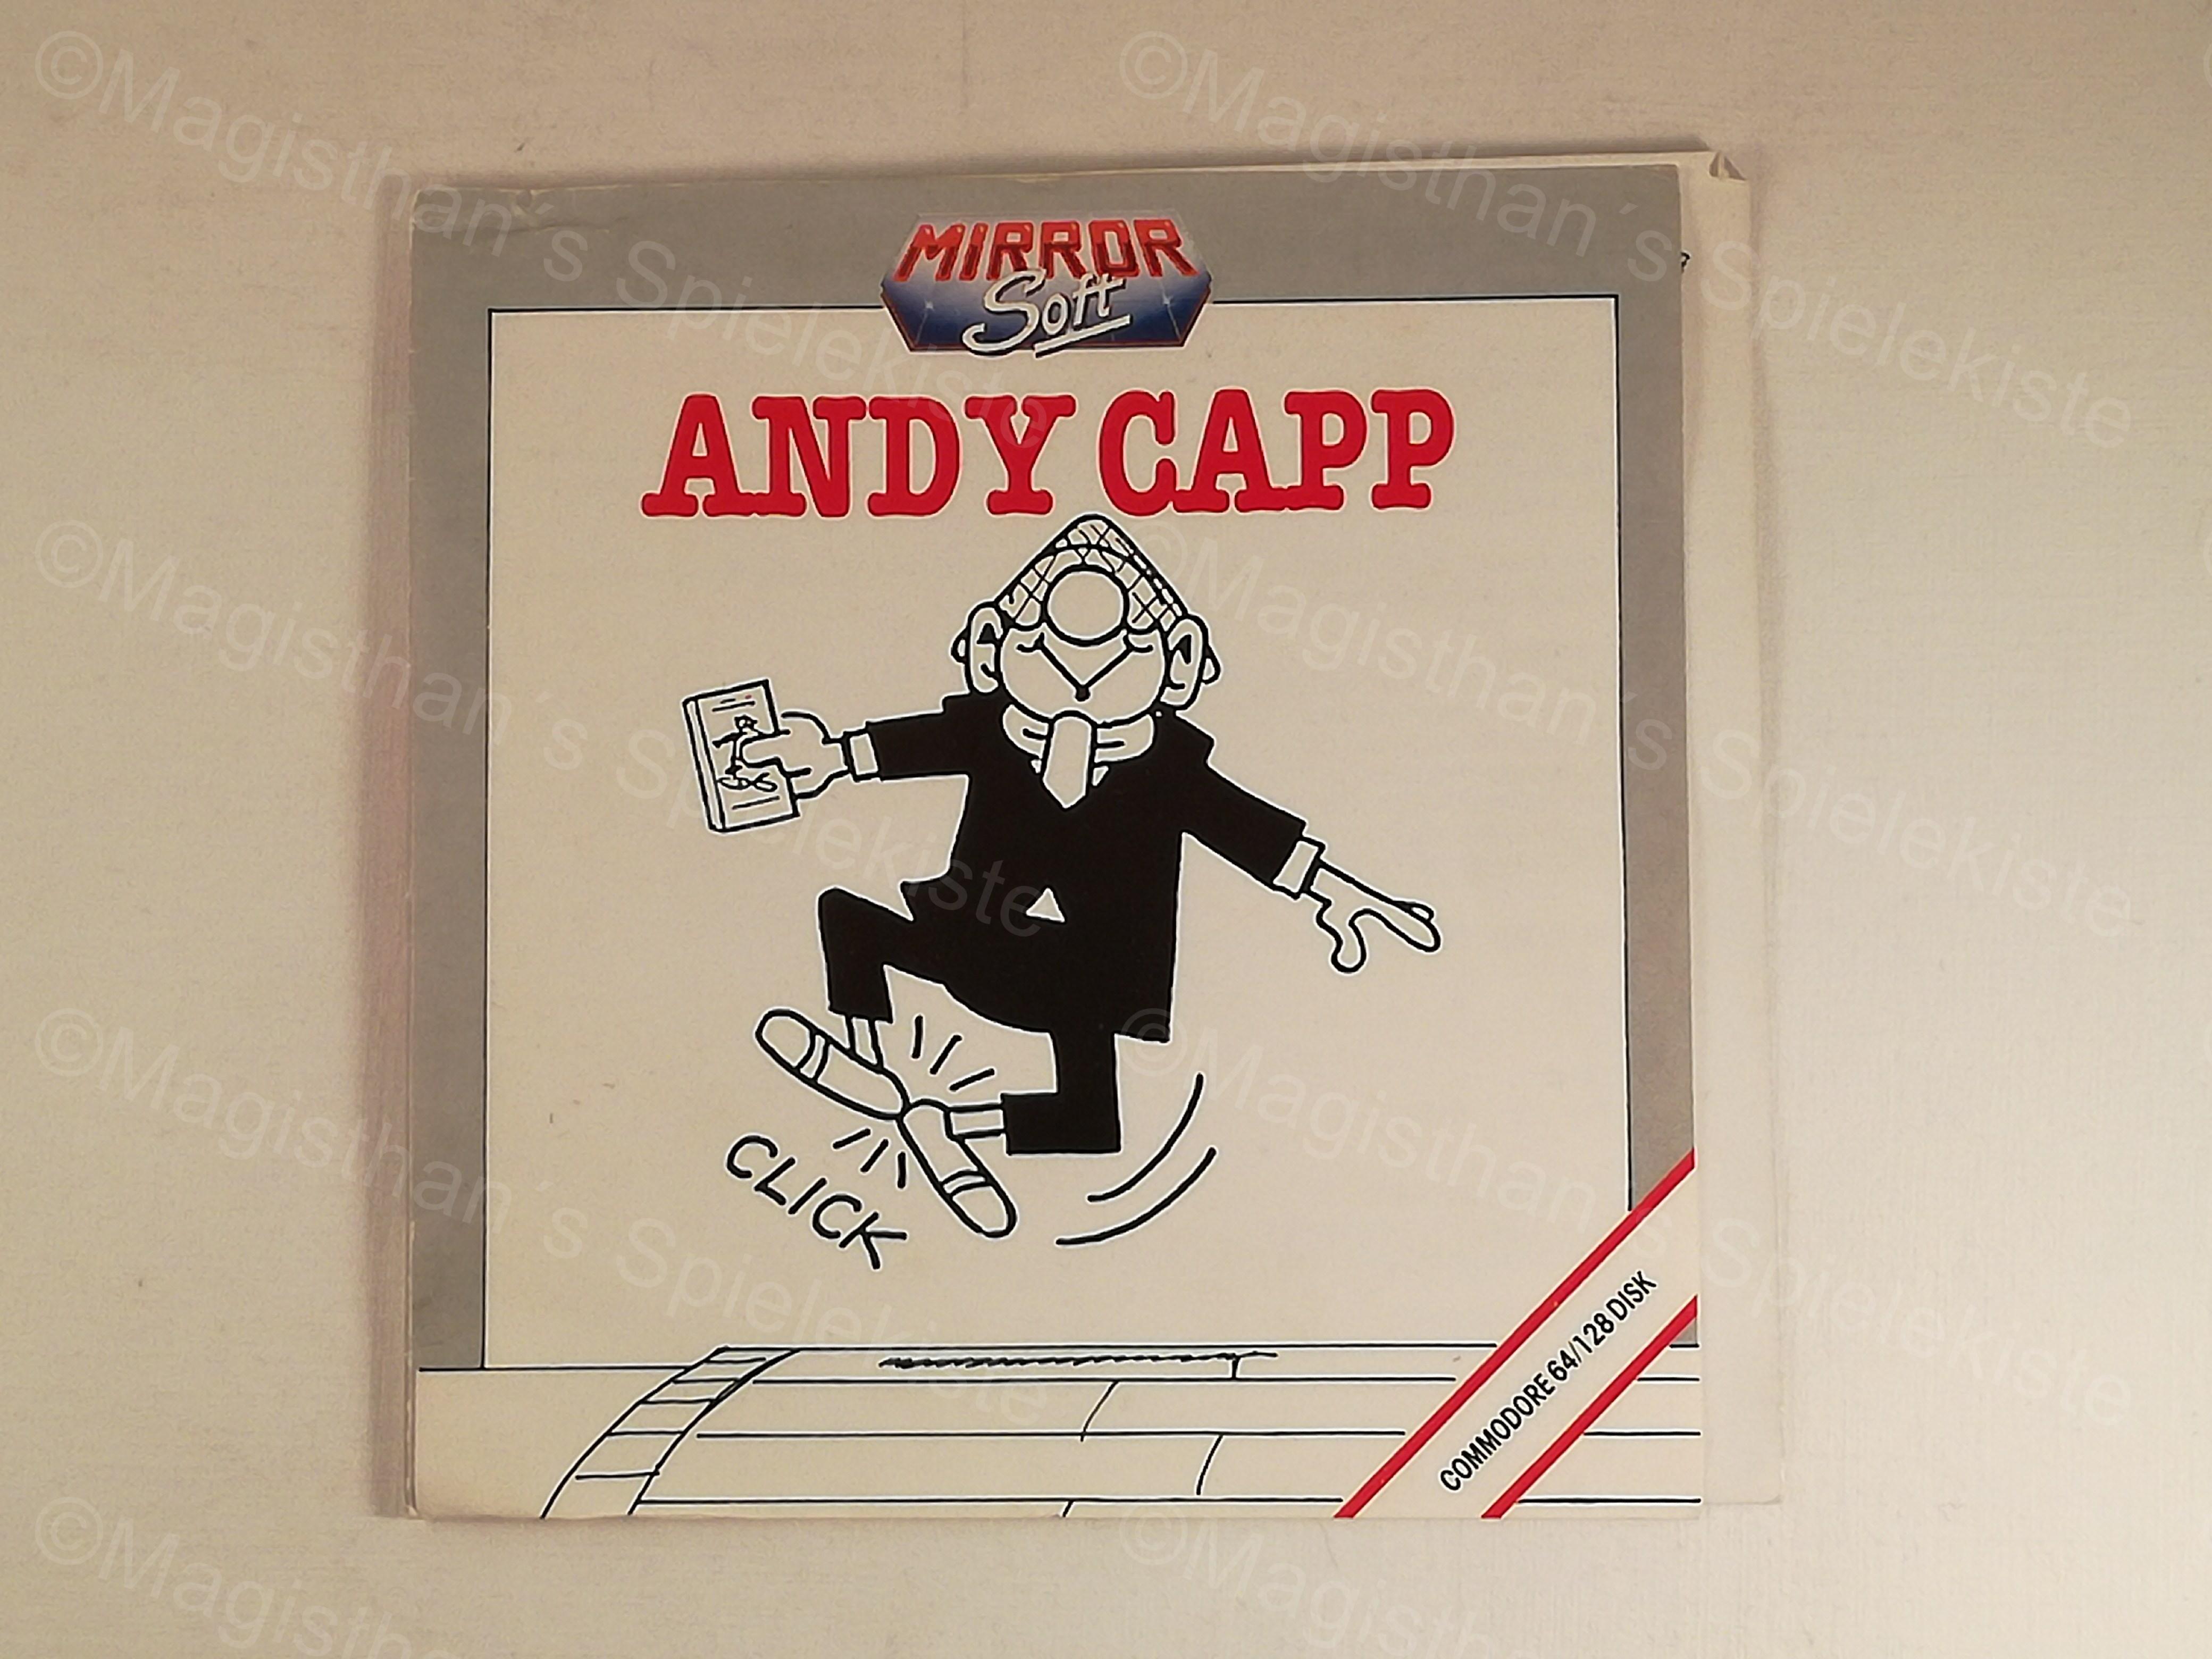 AndyCapp1.jpg